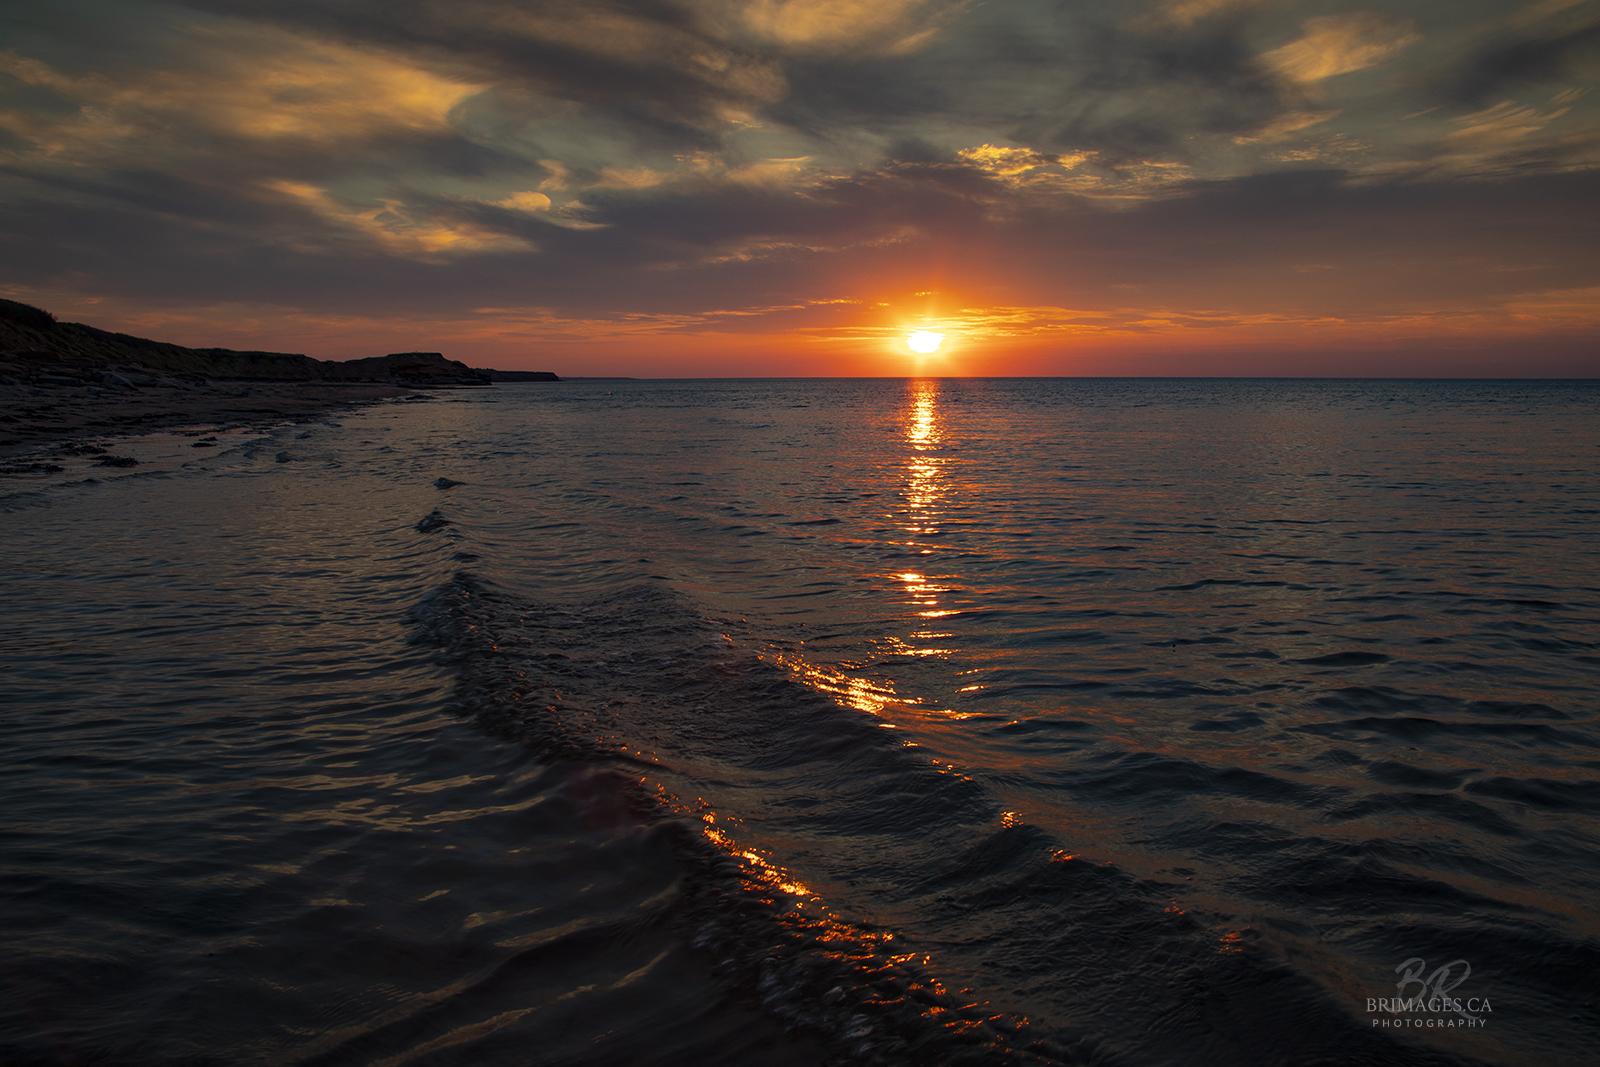 Sunset_PEI_waves_BRimages.ca